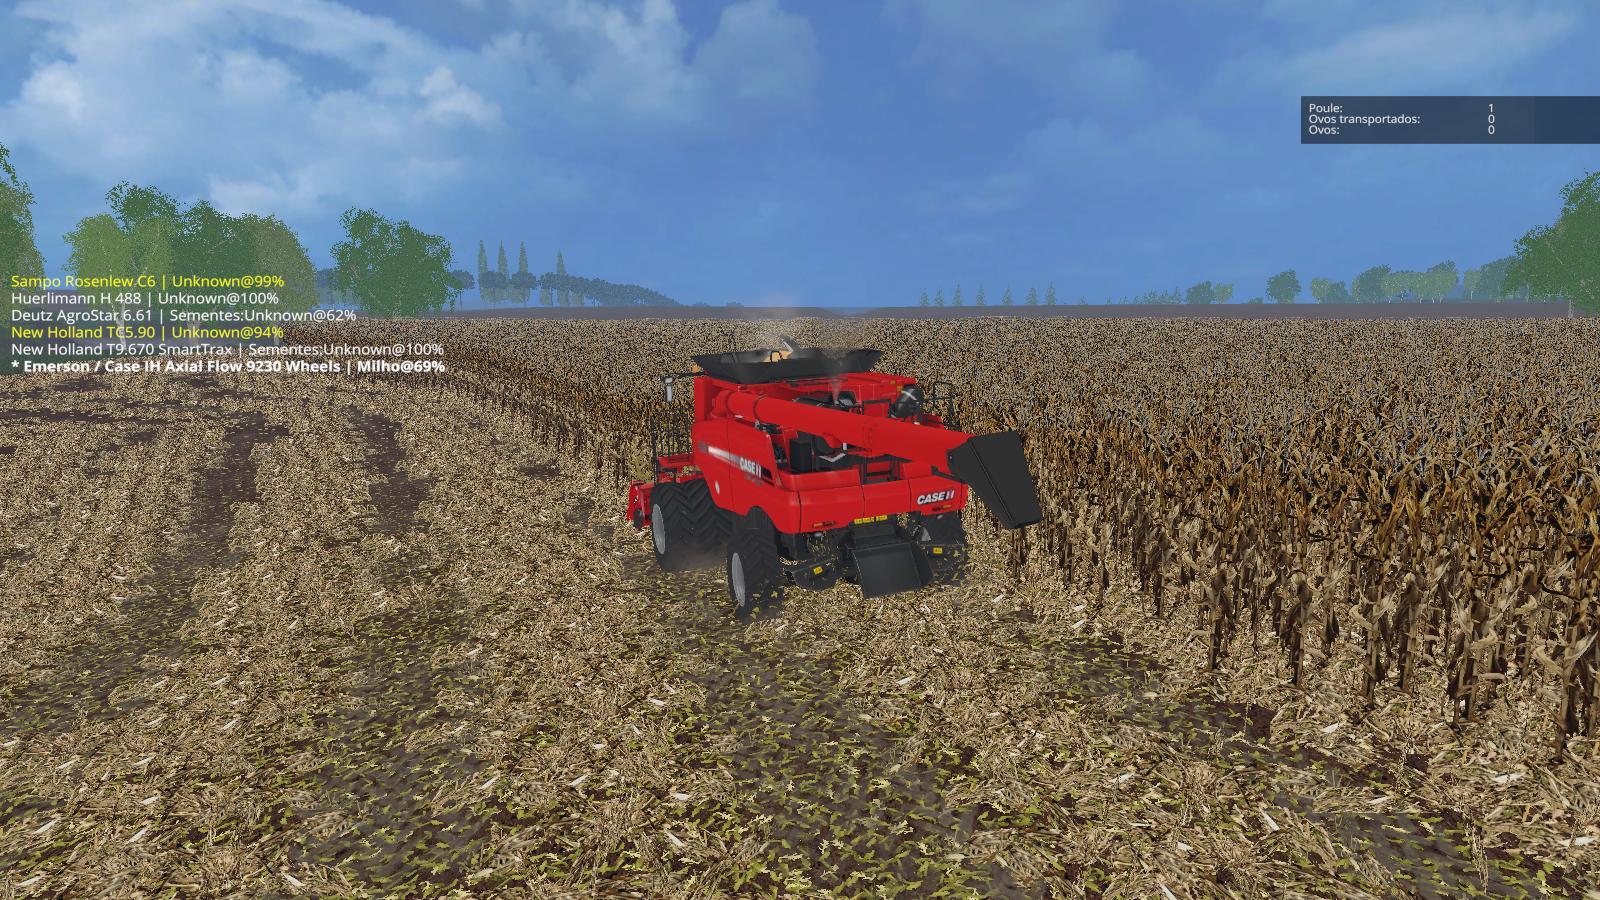 Farming Lady: John Deere 8430 mod for Farming Simulator 2015 / 15 FS